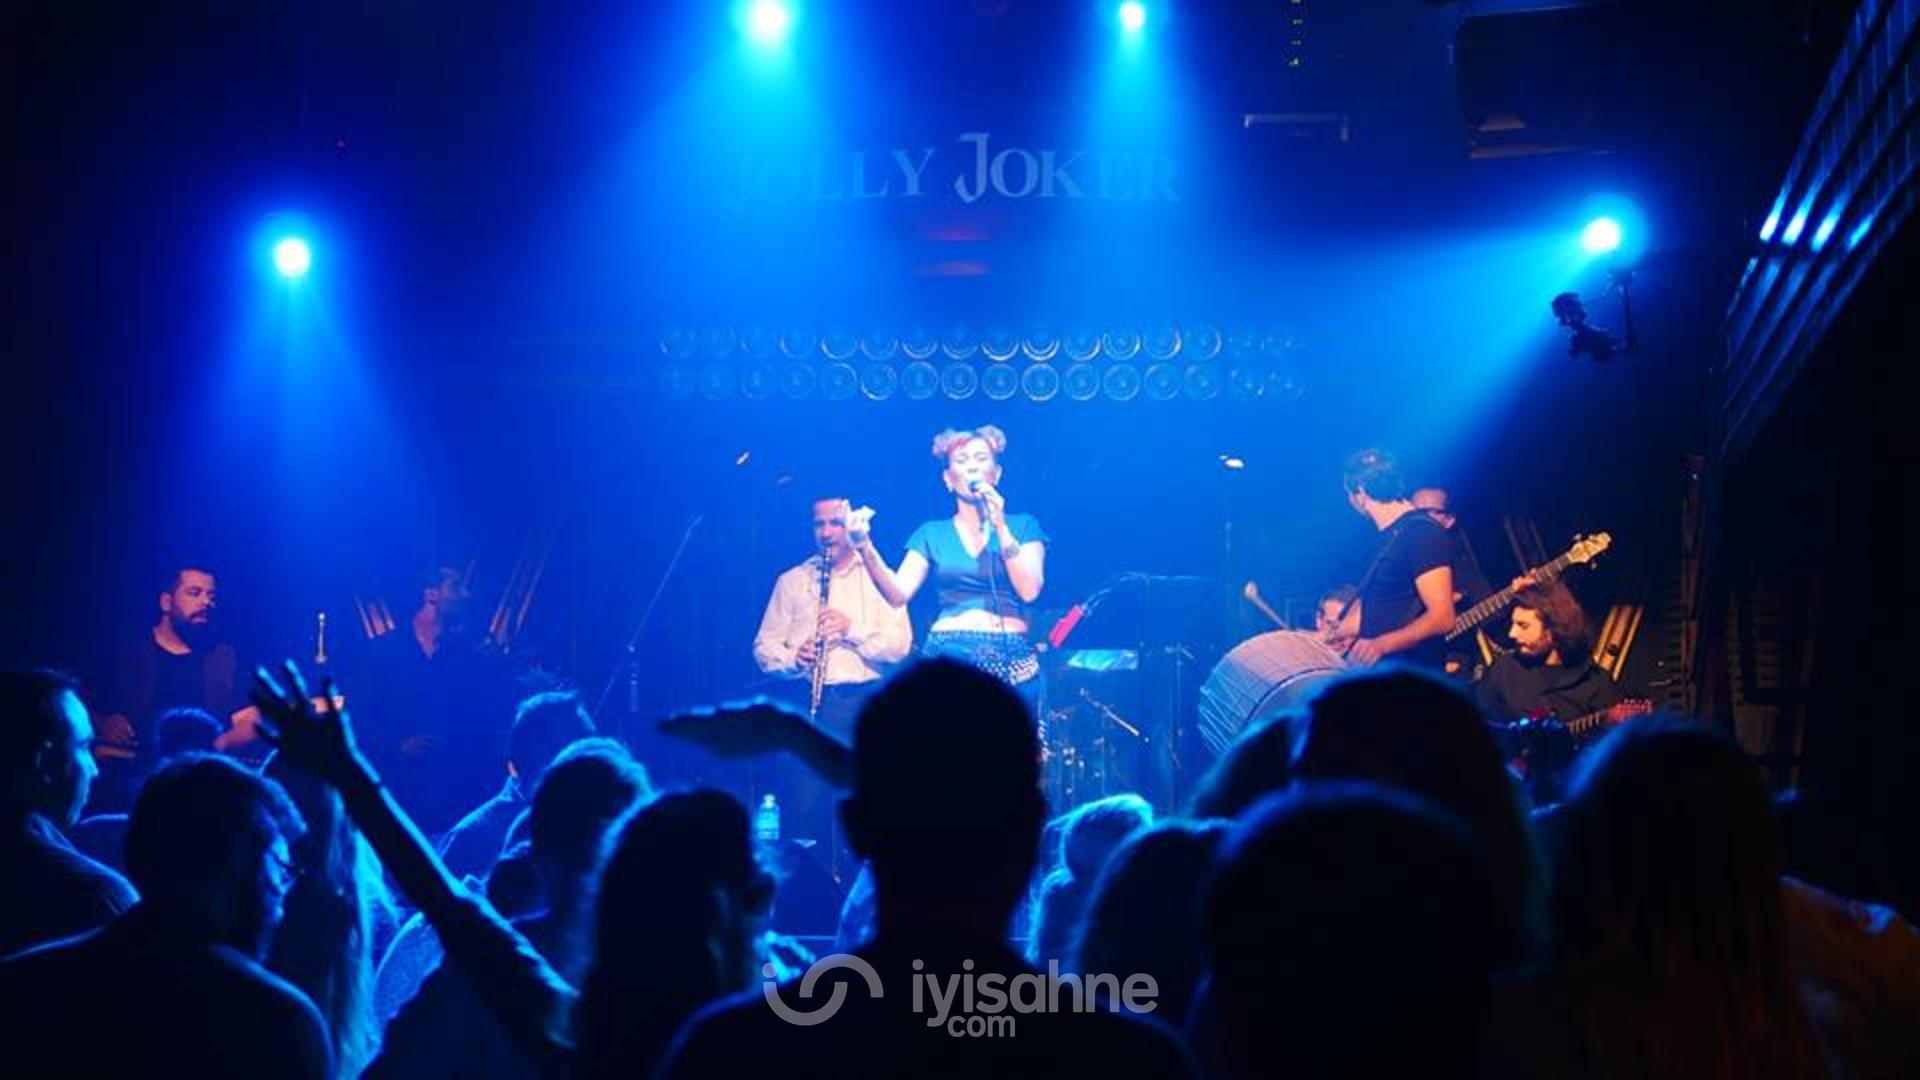 jolly joker İstanbul konseri